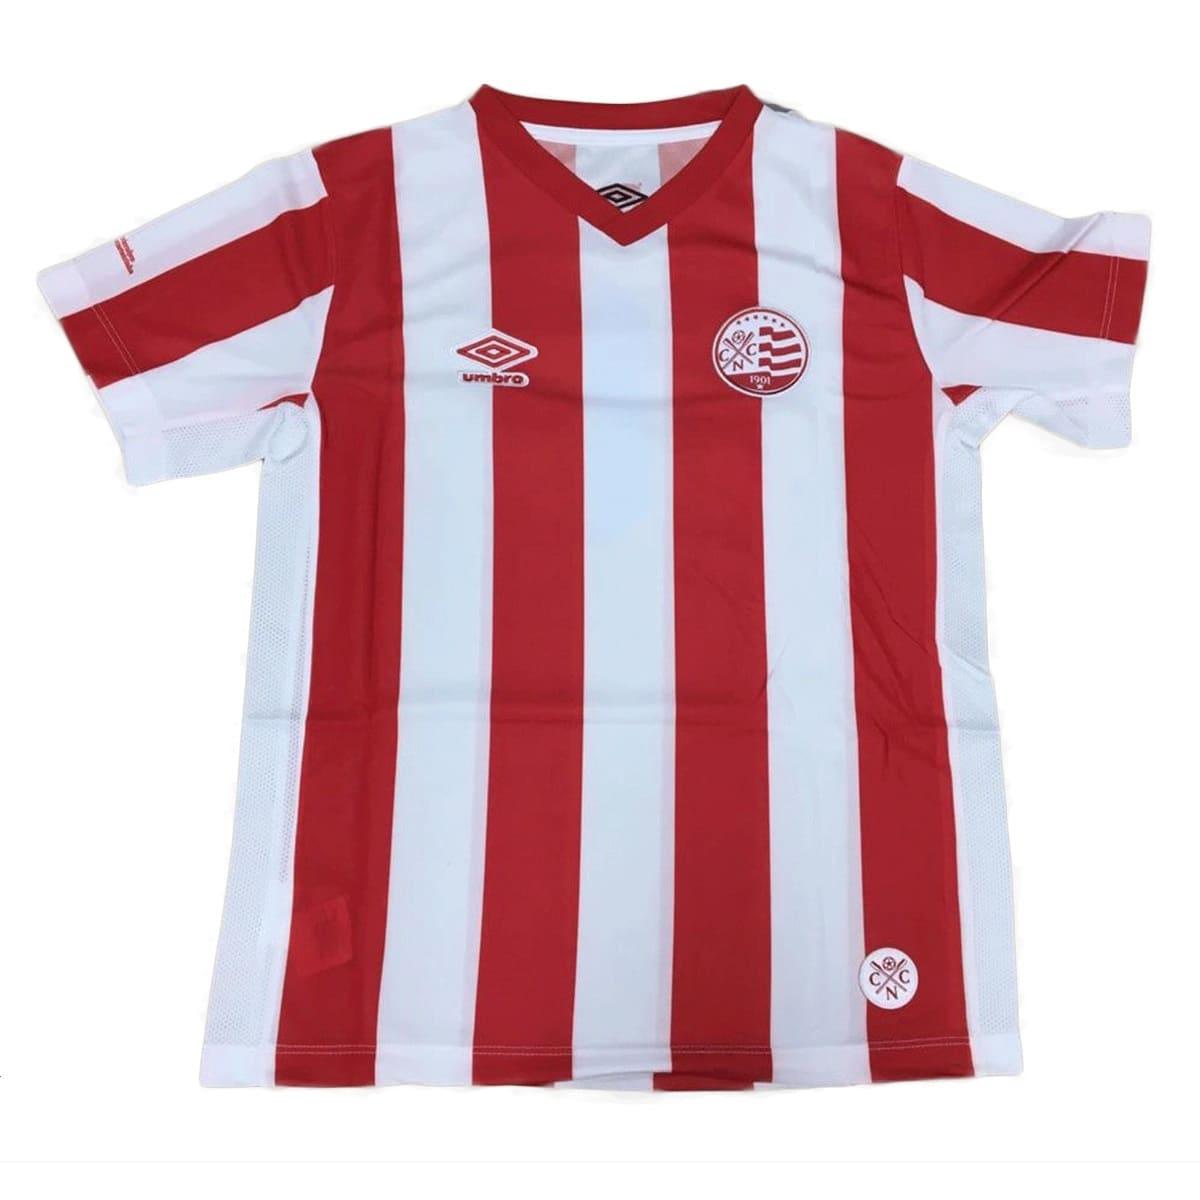 Camisa Náutico Umbro Infantil 2014 Vermelho Branco